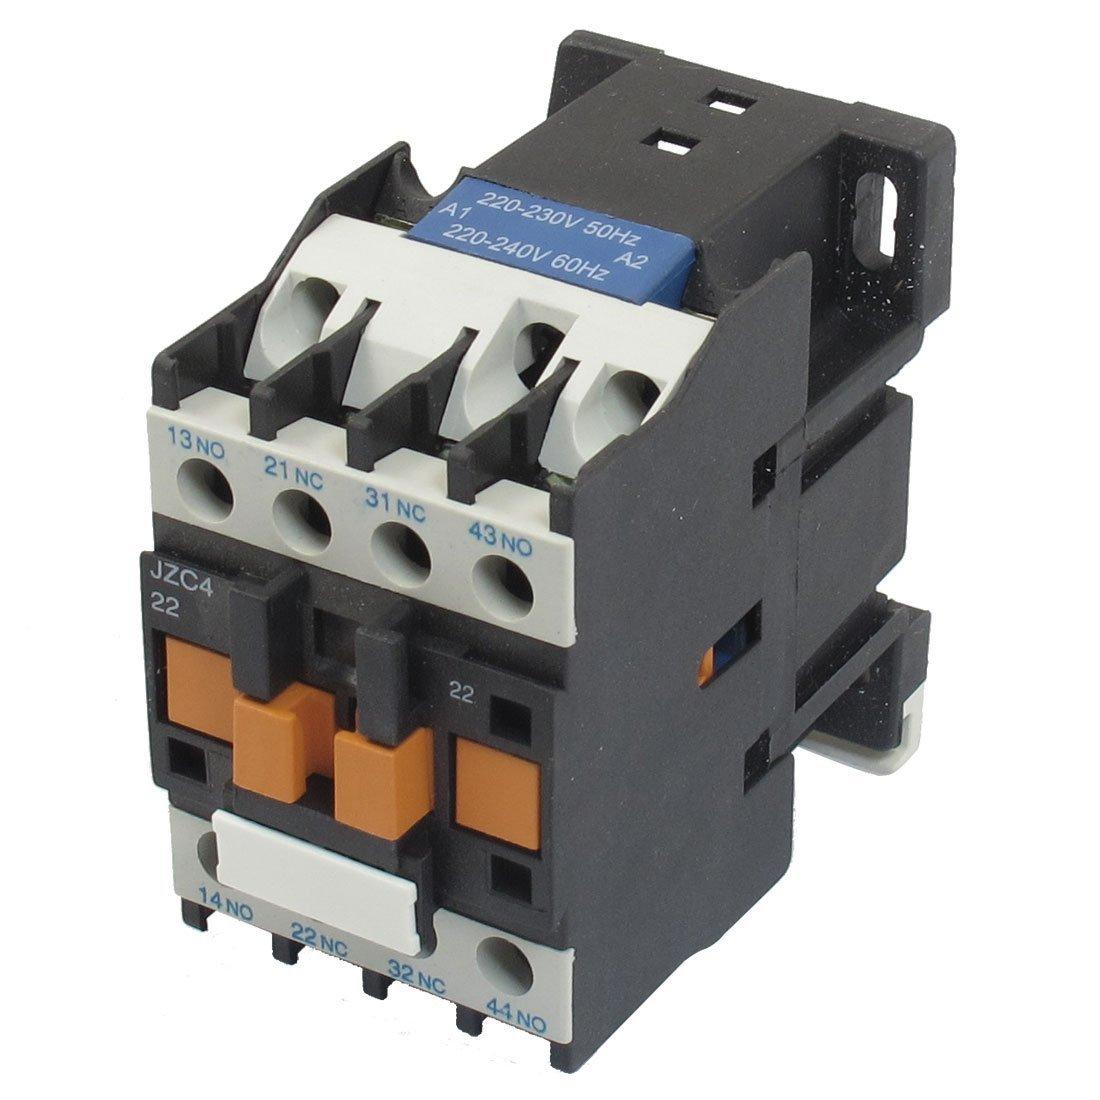 medium resolution of promotion jzc4 22 220 240v 50 60hz coil 20a 2p three pole